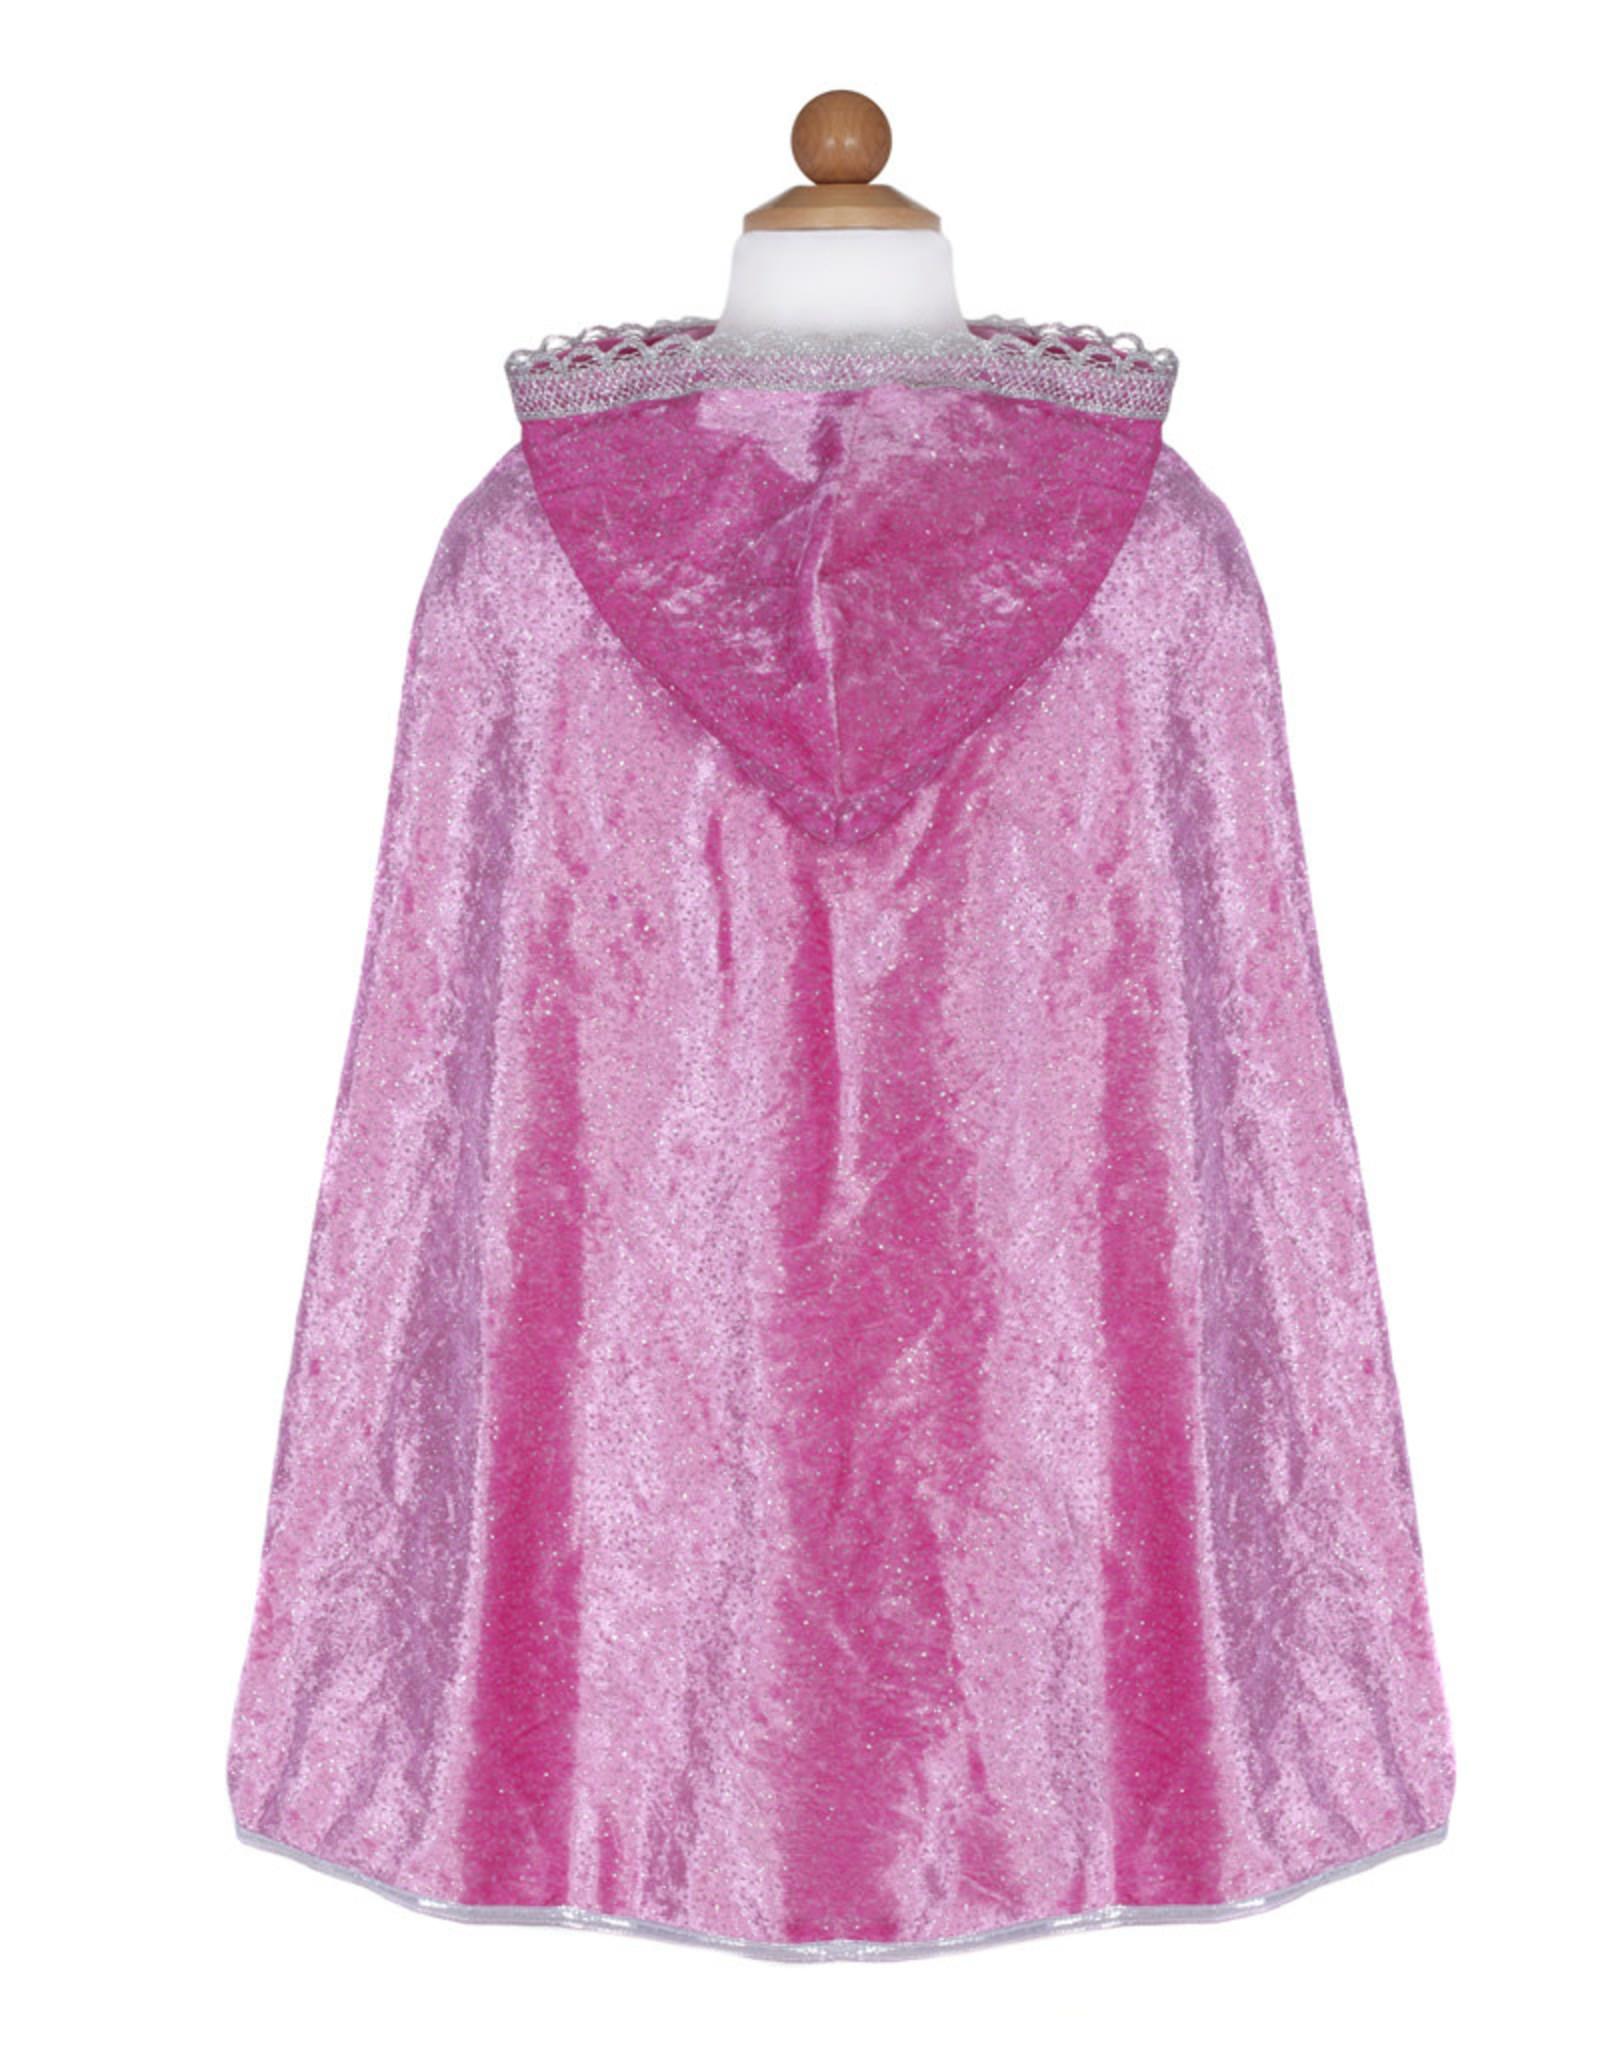 Great Pretenders Diamond Sparkle Cape, Dk Pink, Size 3-4